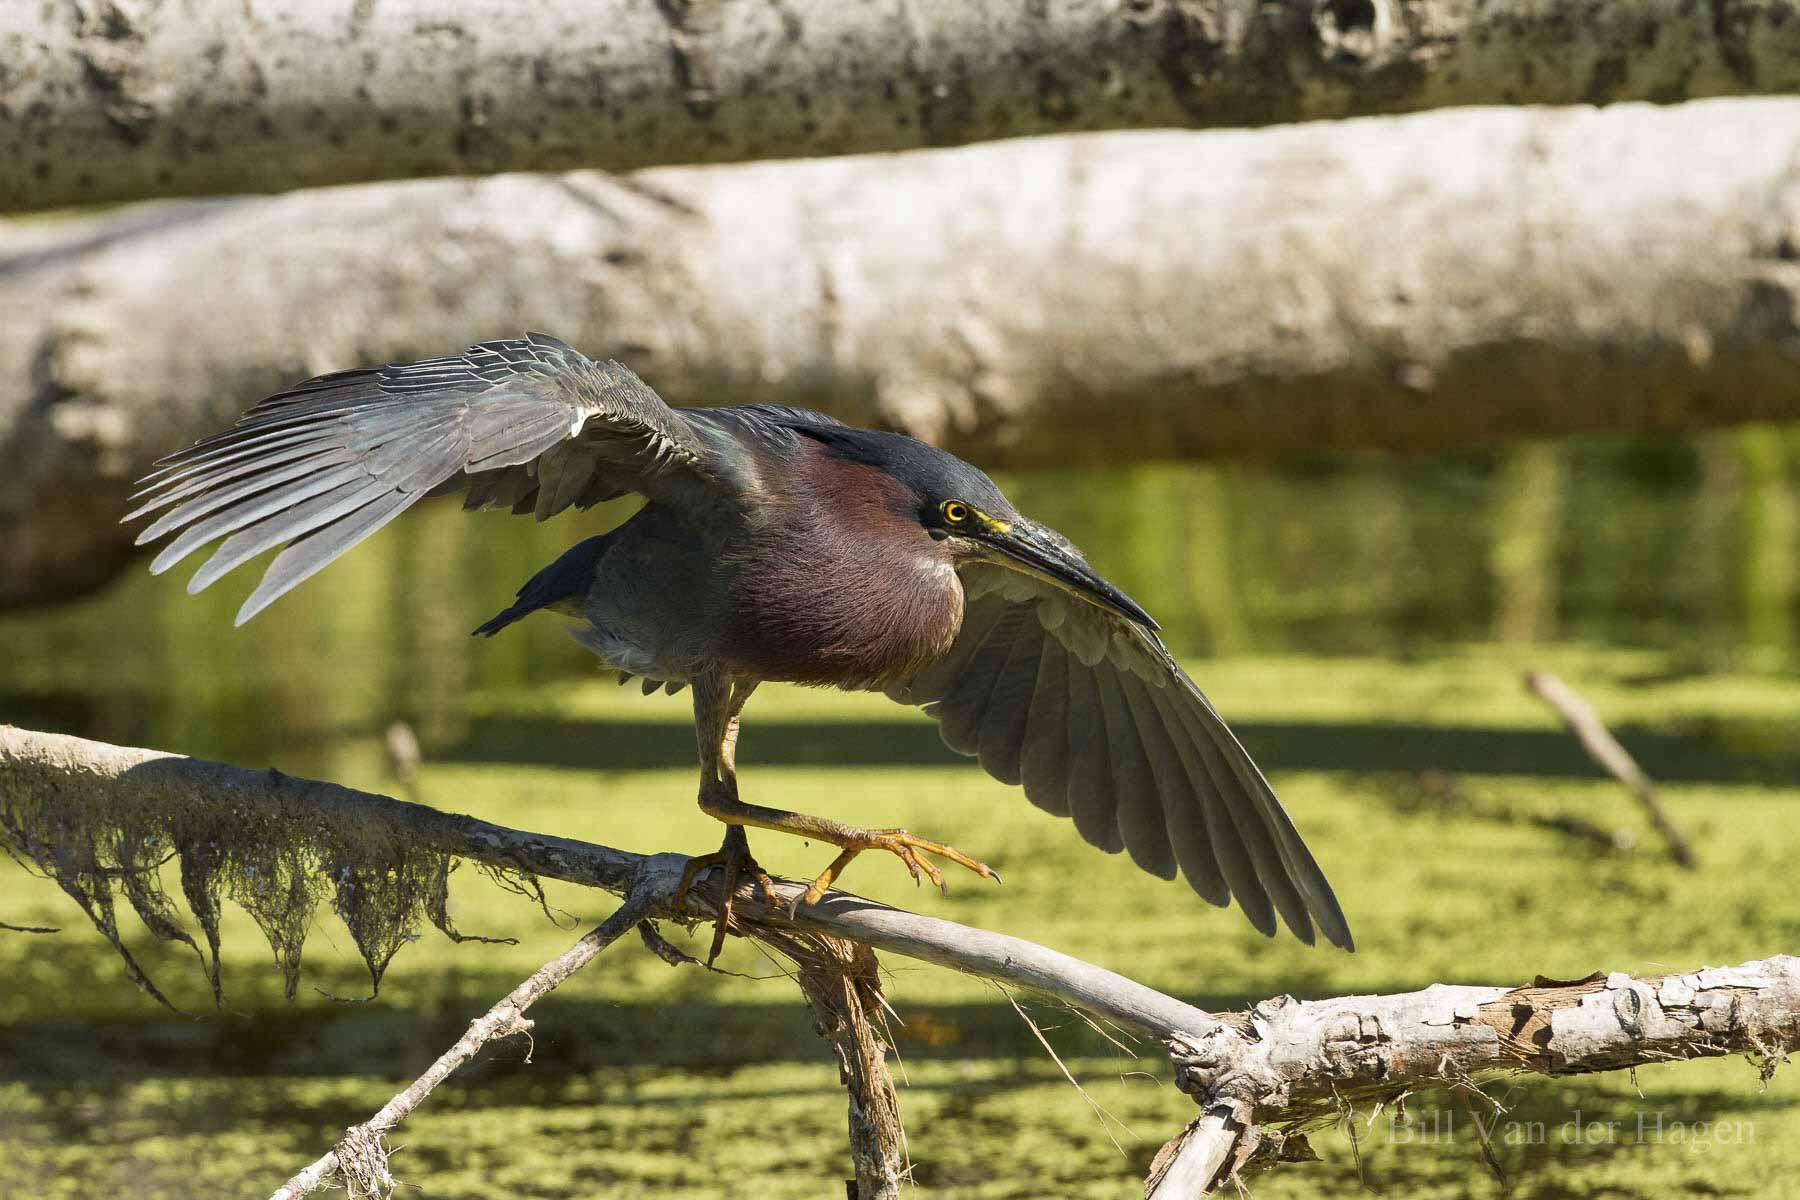 green heron fighting stance on log